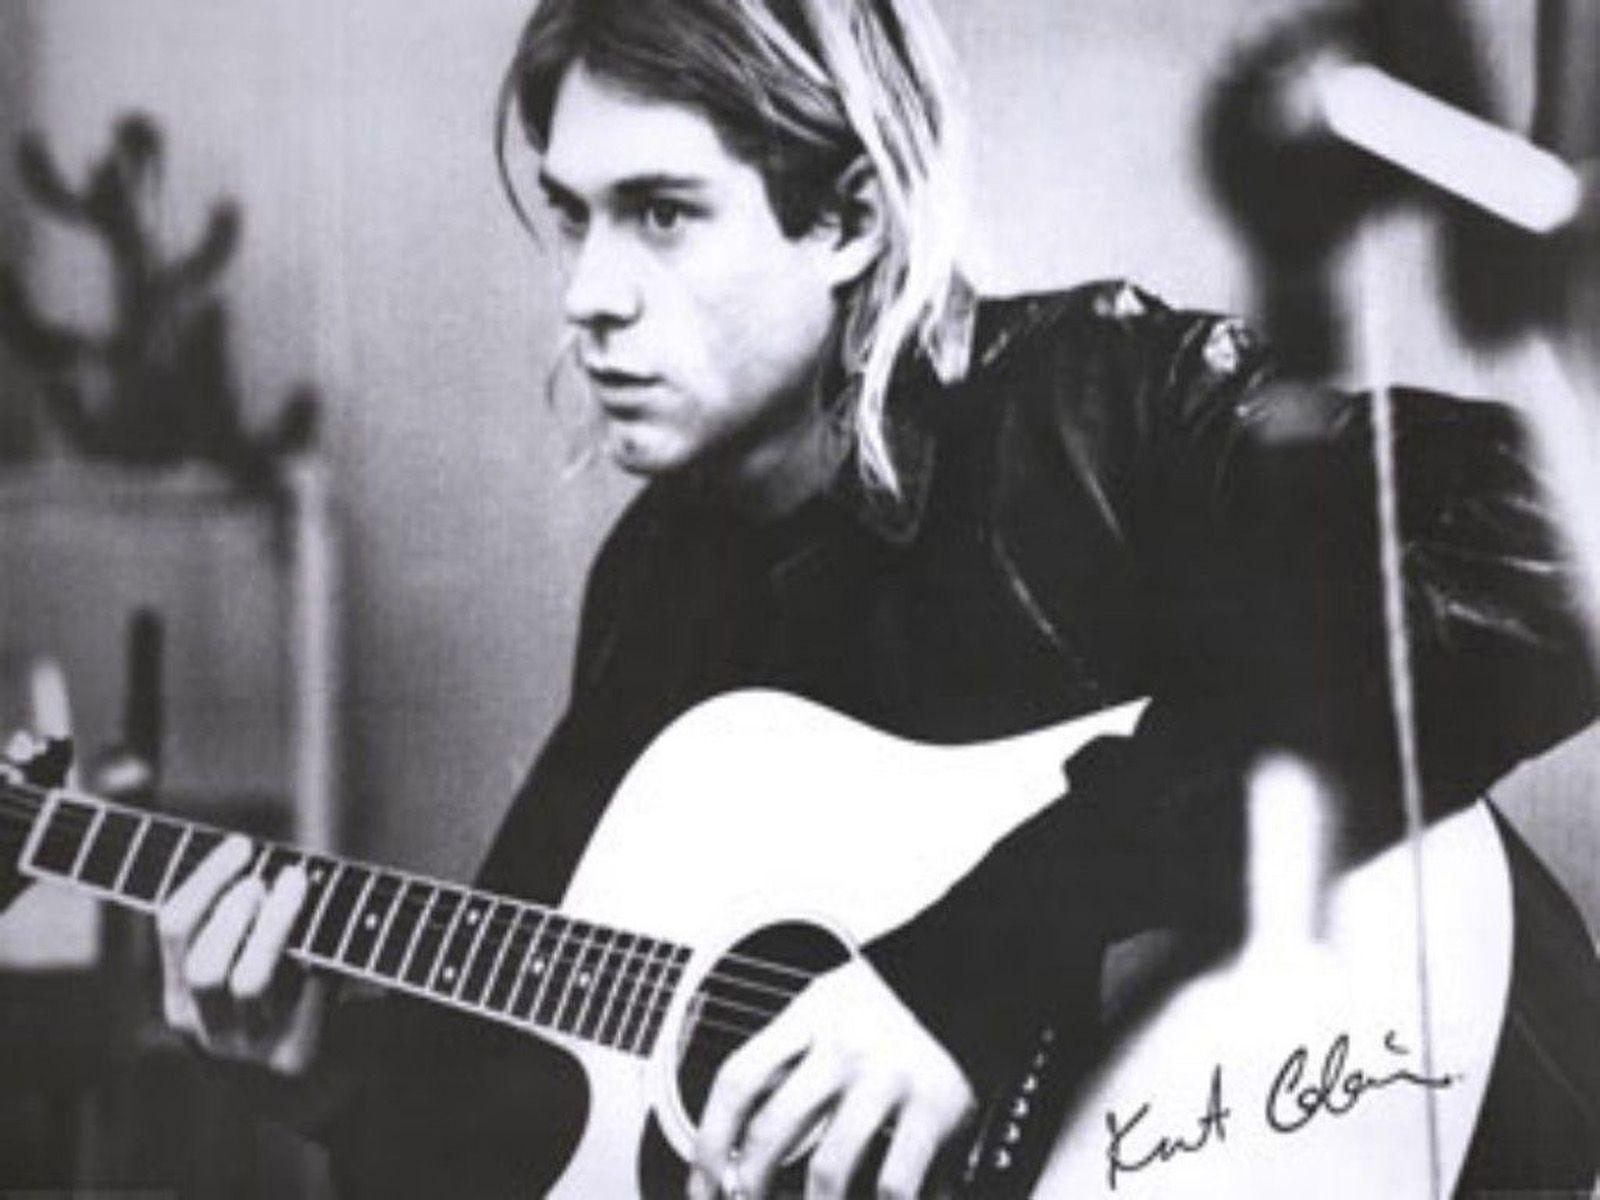 Kurt Cobain Backgrounds - Wallpaper Cave